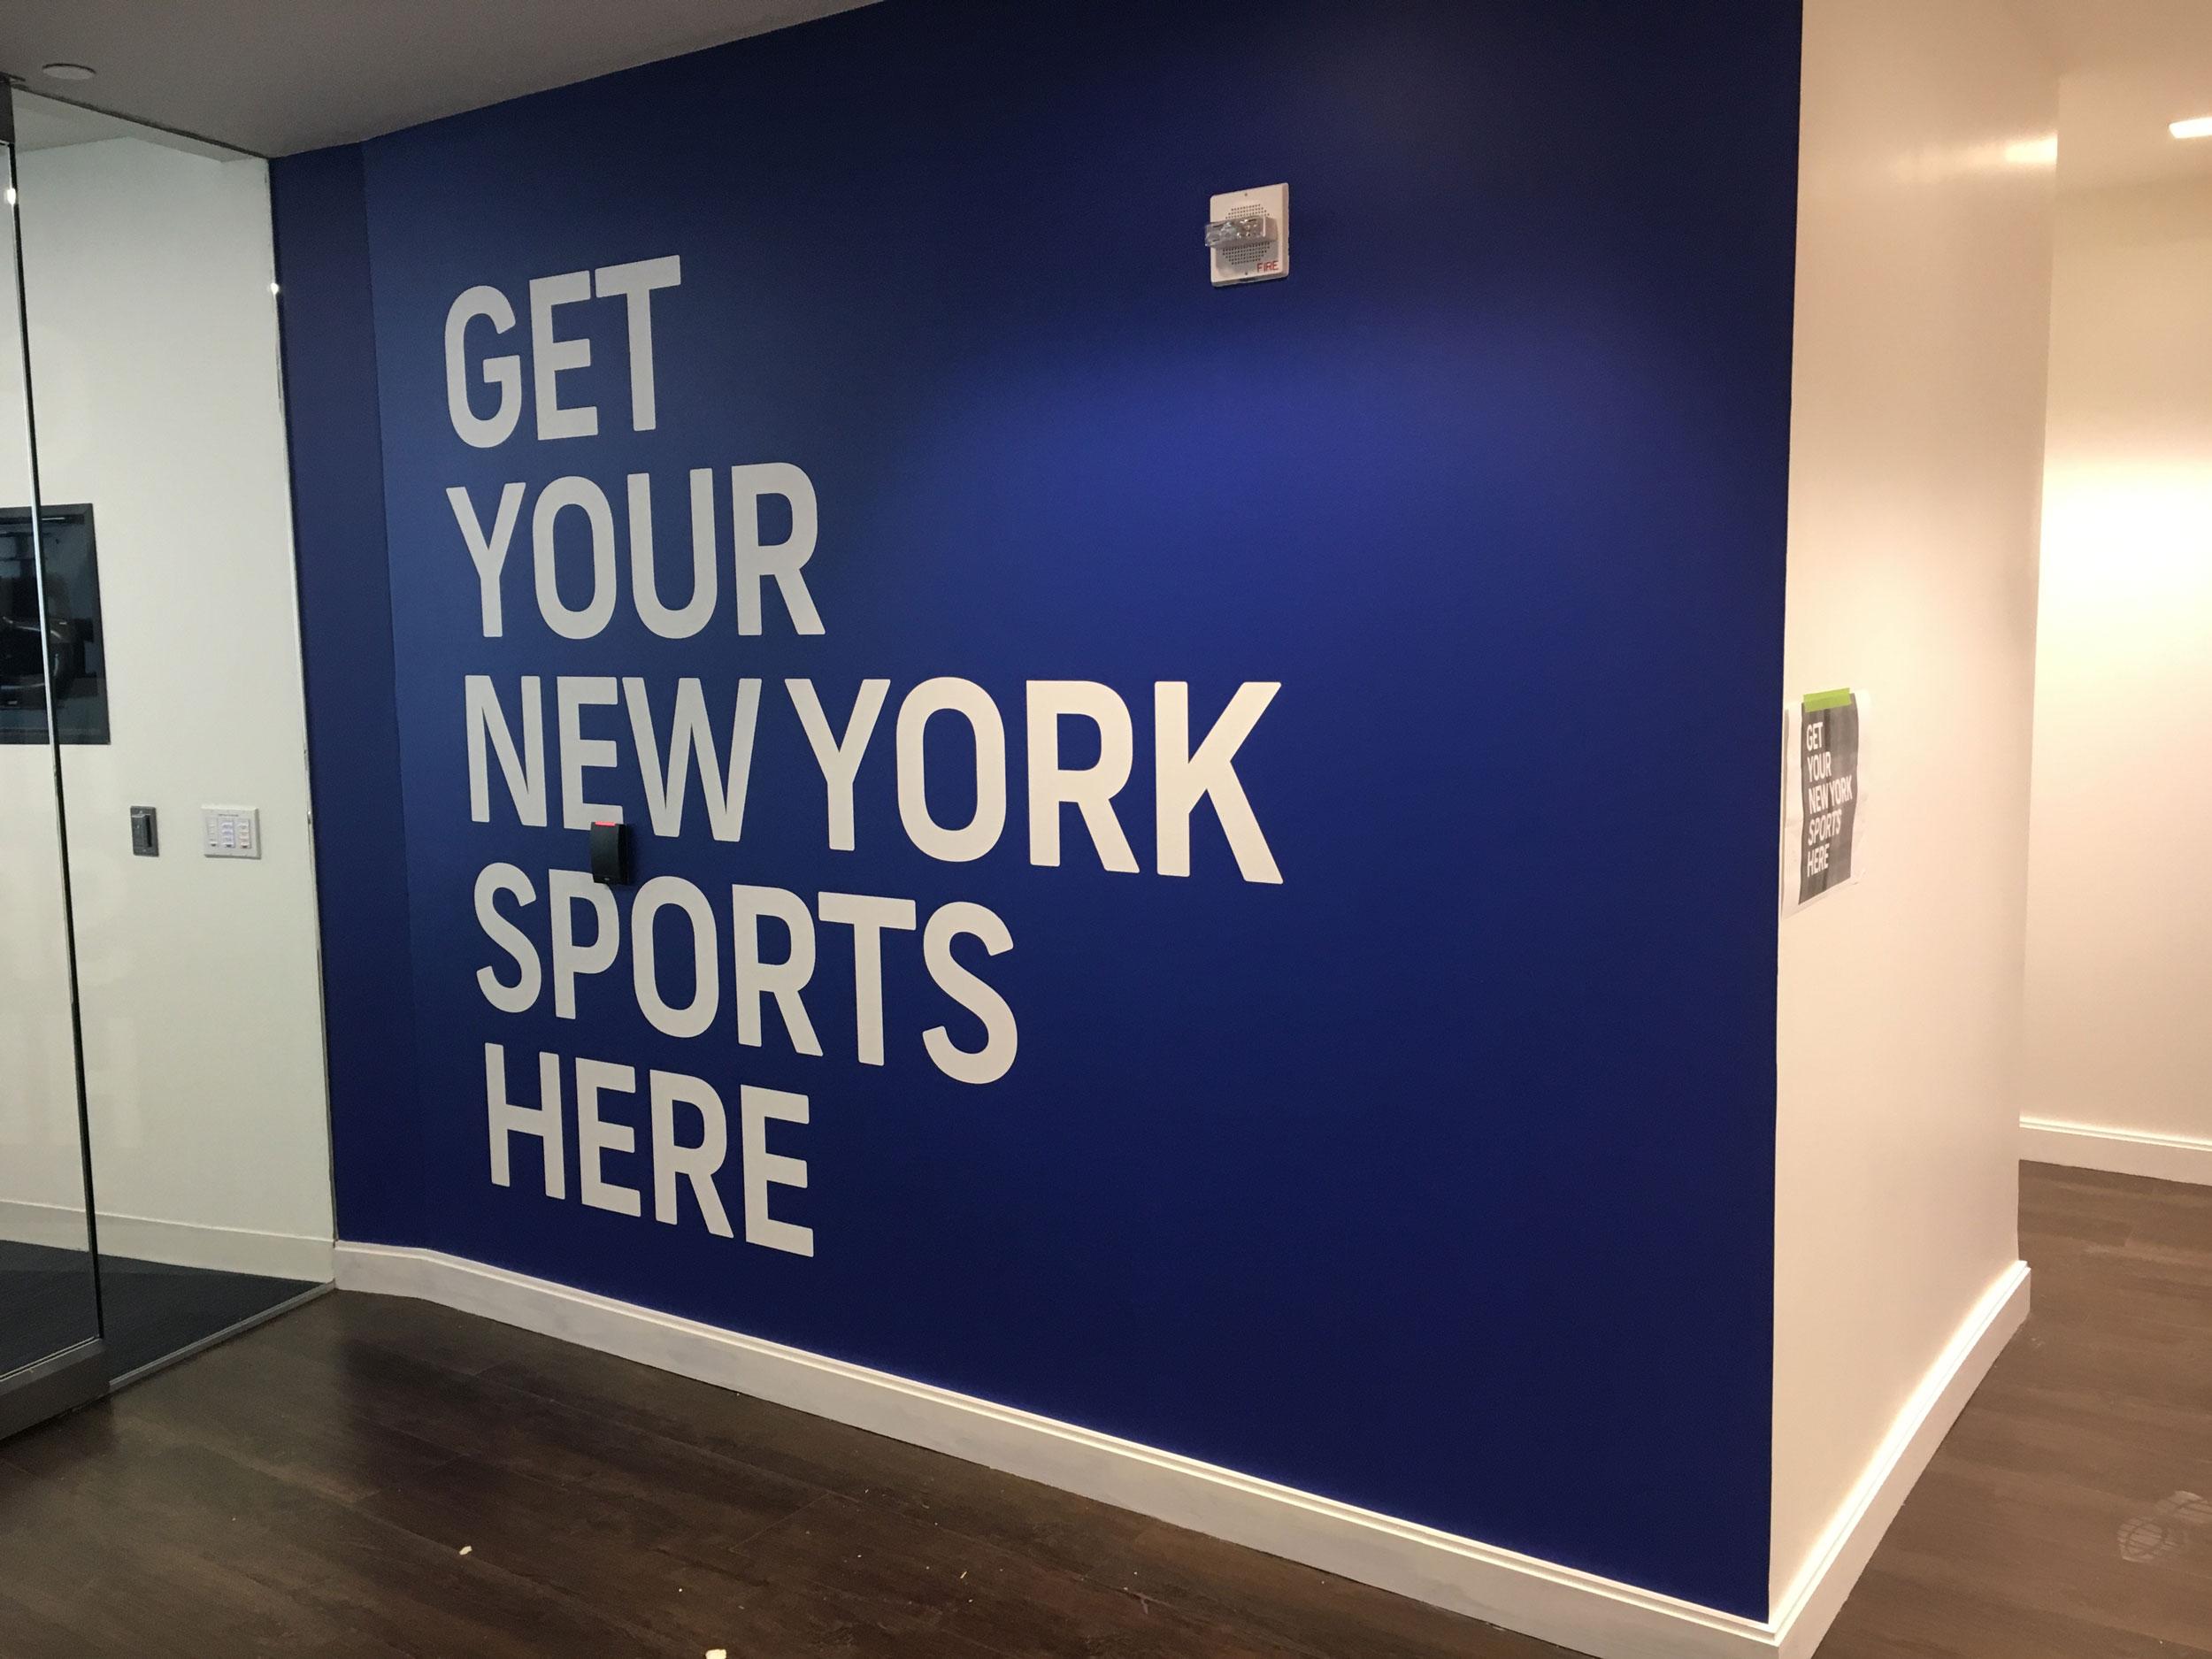 Sports New York Tagline